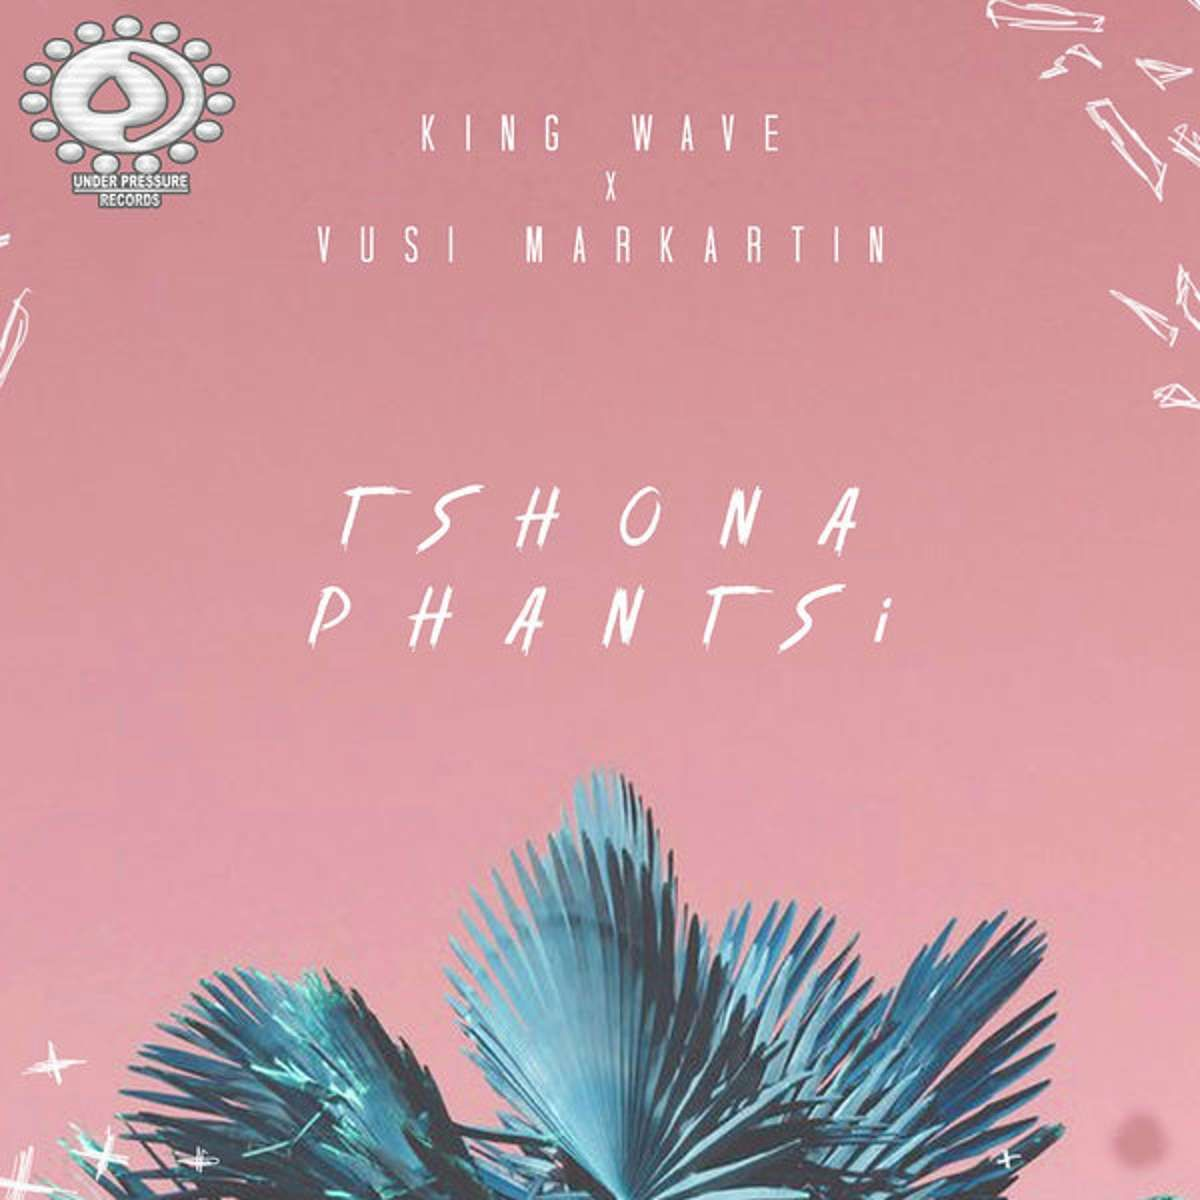 King Wave feat  Vusi Markartin - Tshona Phantsi (Acapella